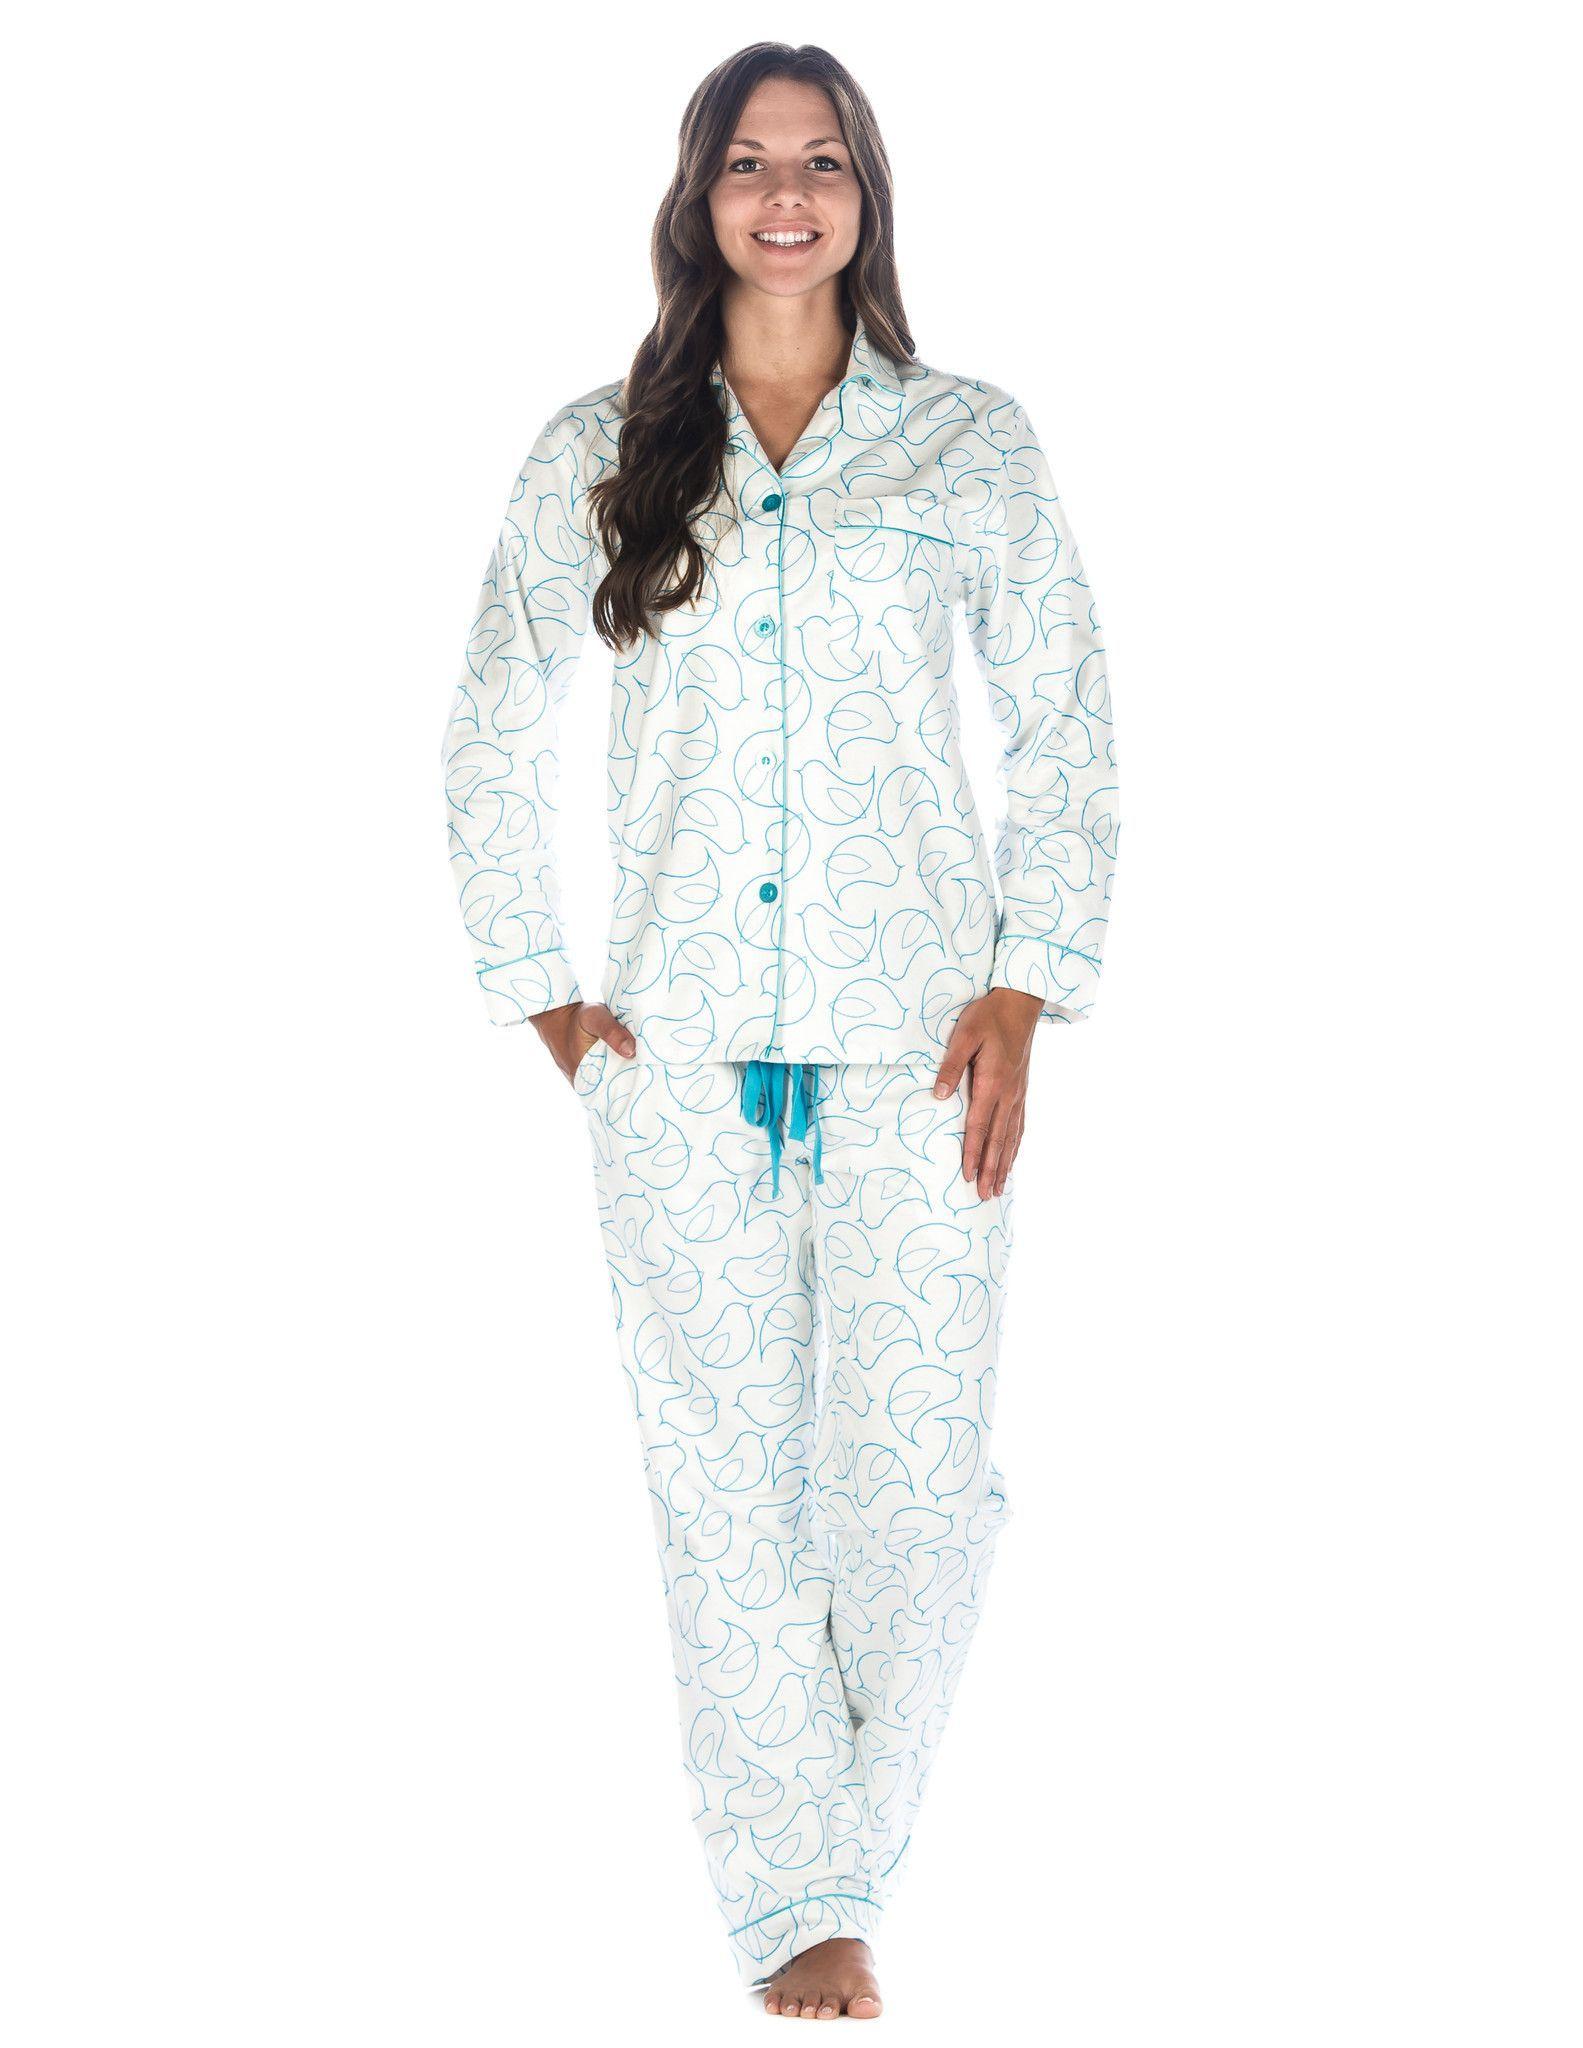 Flannel cardigan womens  Boxed Pacakged Womens Premium Cotton Flannel Pajama Sleepwear Set